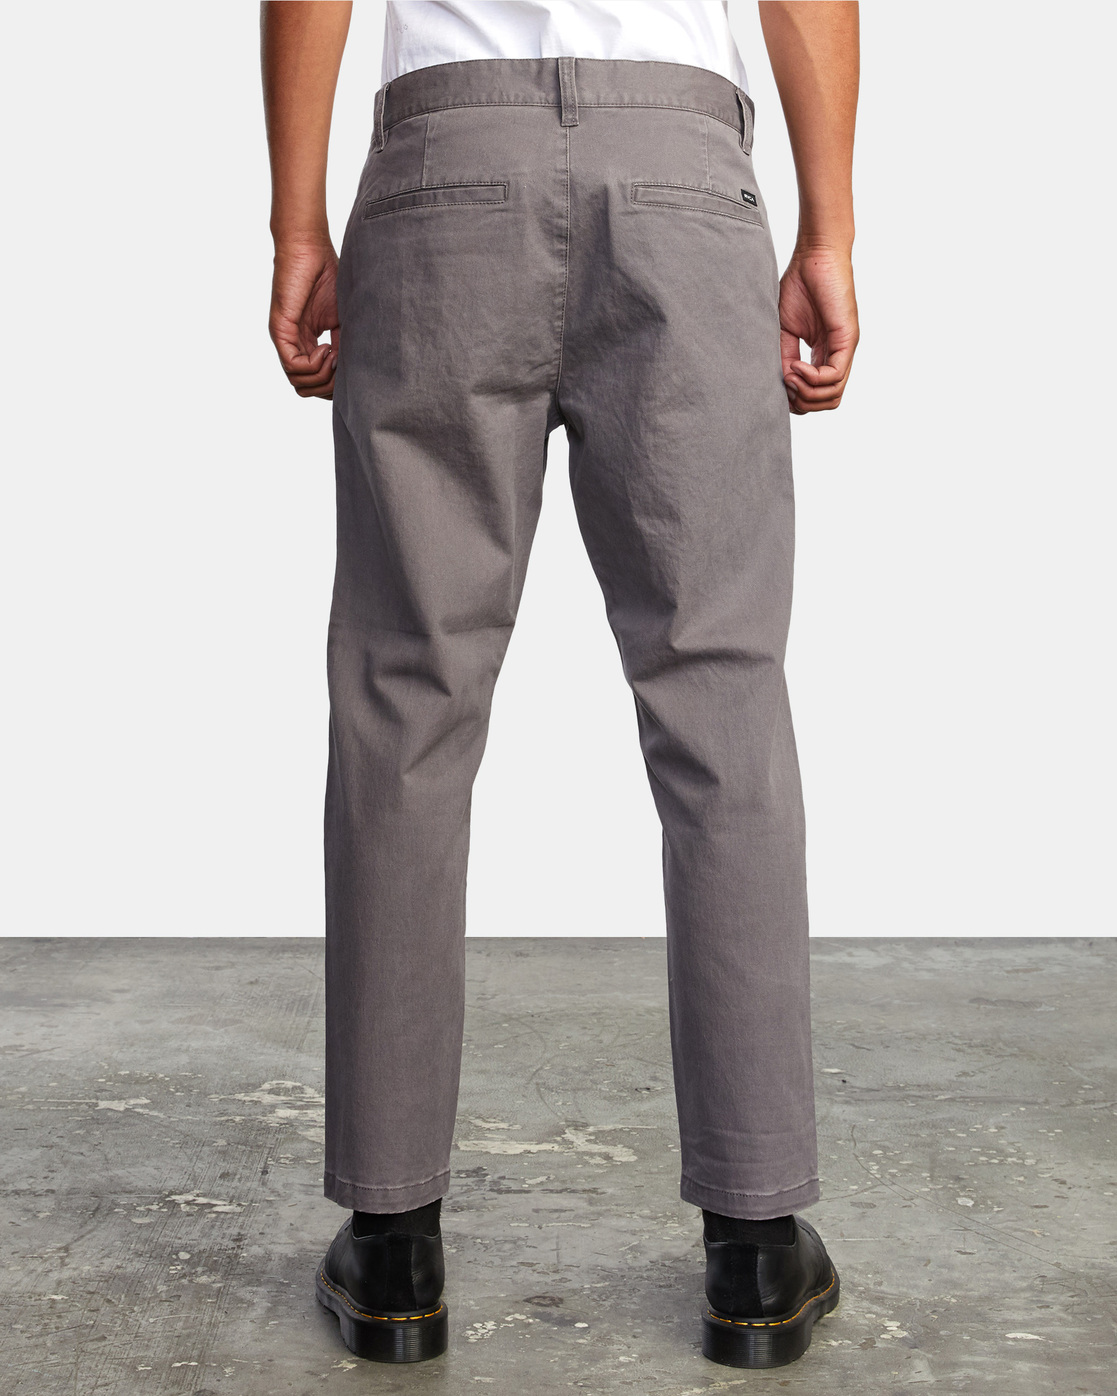 8 HITCHER PANT Grey ME303HIT RVCA